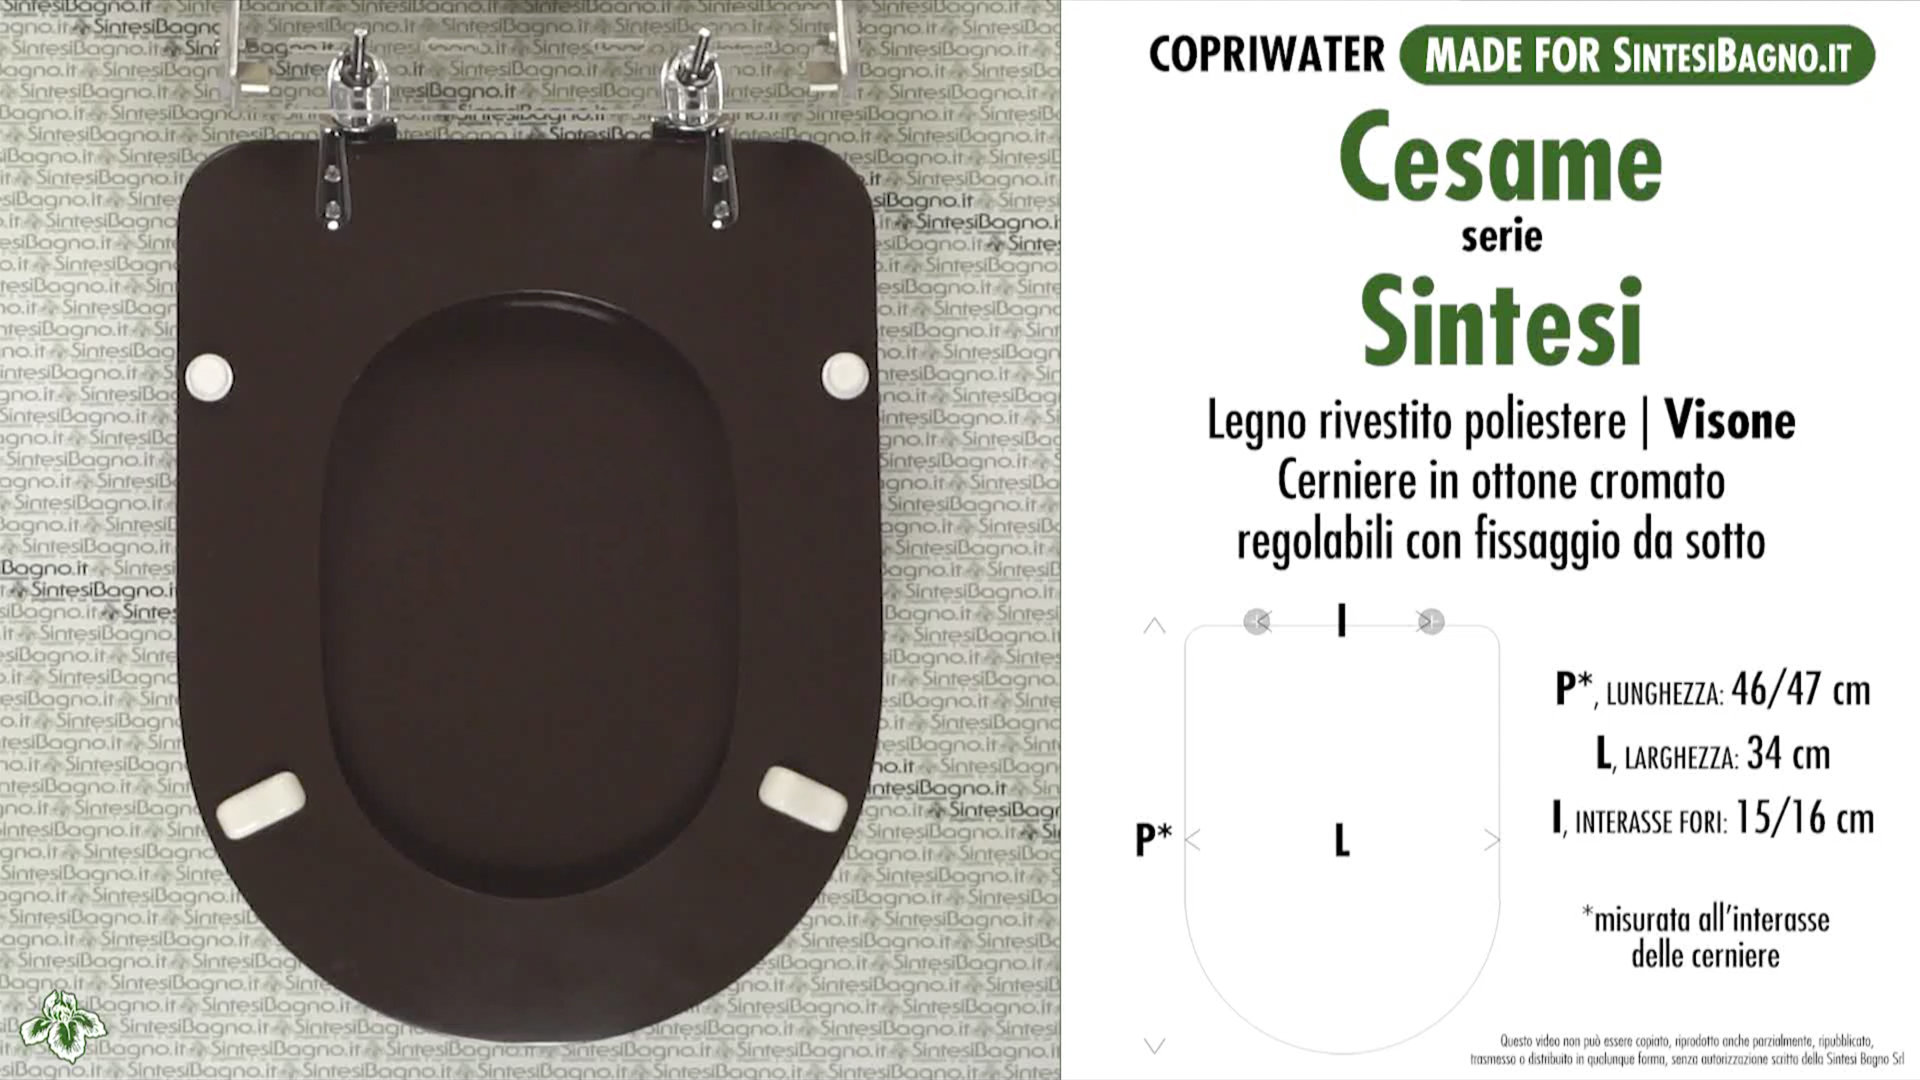 Sedile Wc Cesame Sintesi.Wc Seat Made For Wc Sintesi Cesame Model Cesame Mink Type Dedicated Sintesibagno Shop Online